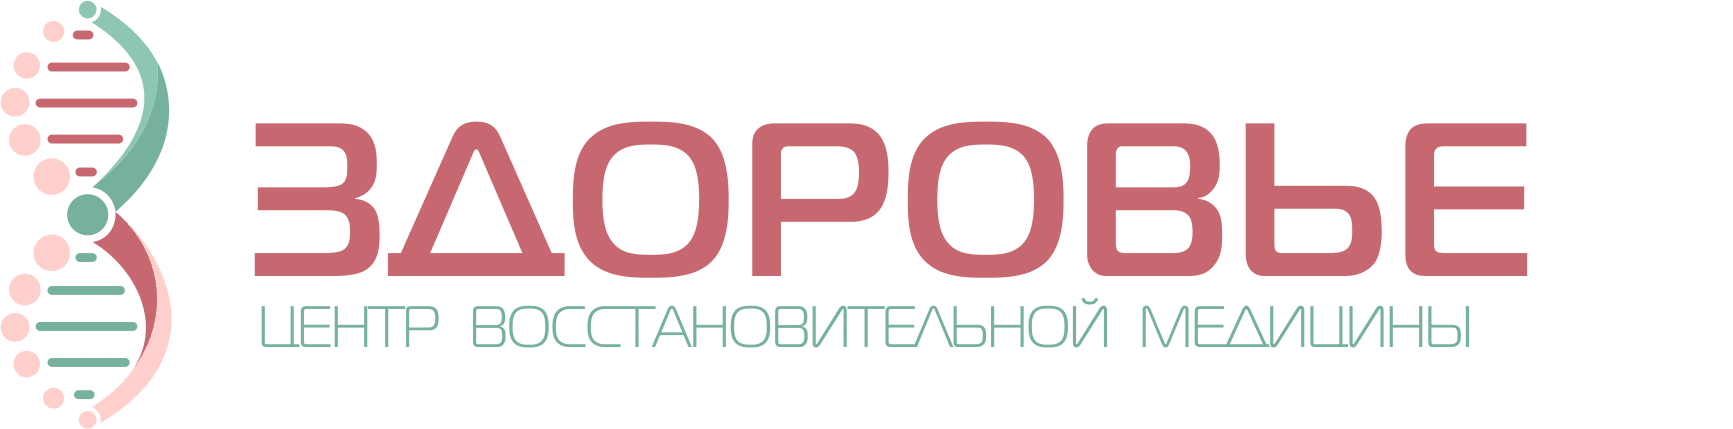 Логотип клиники Здоровье